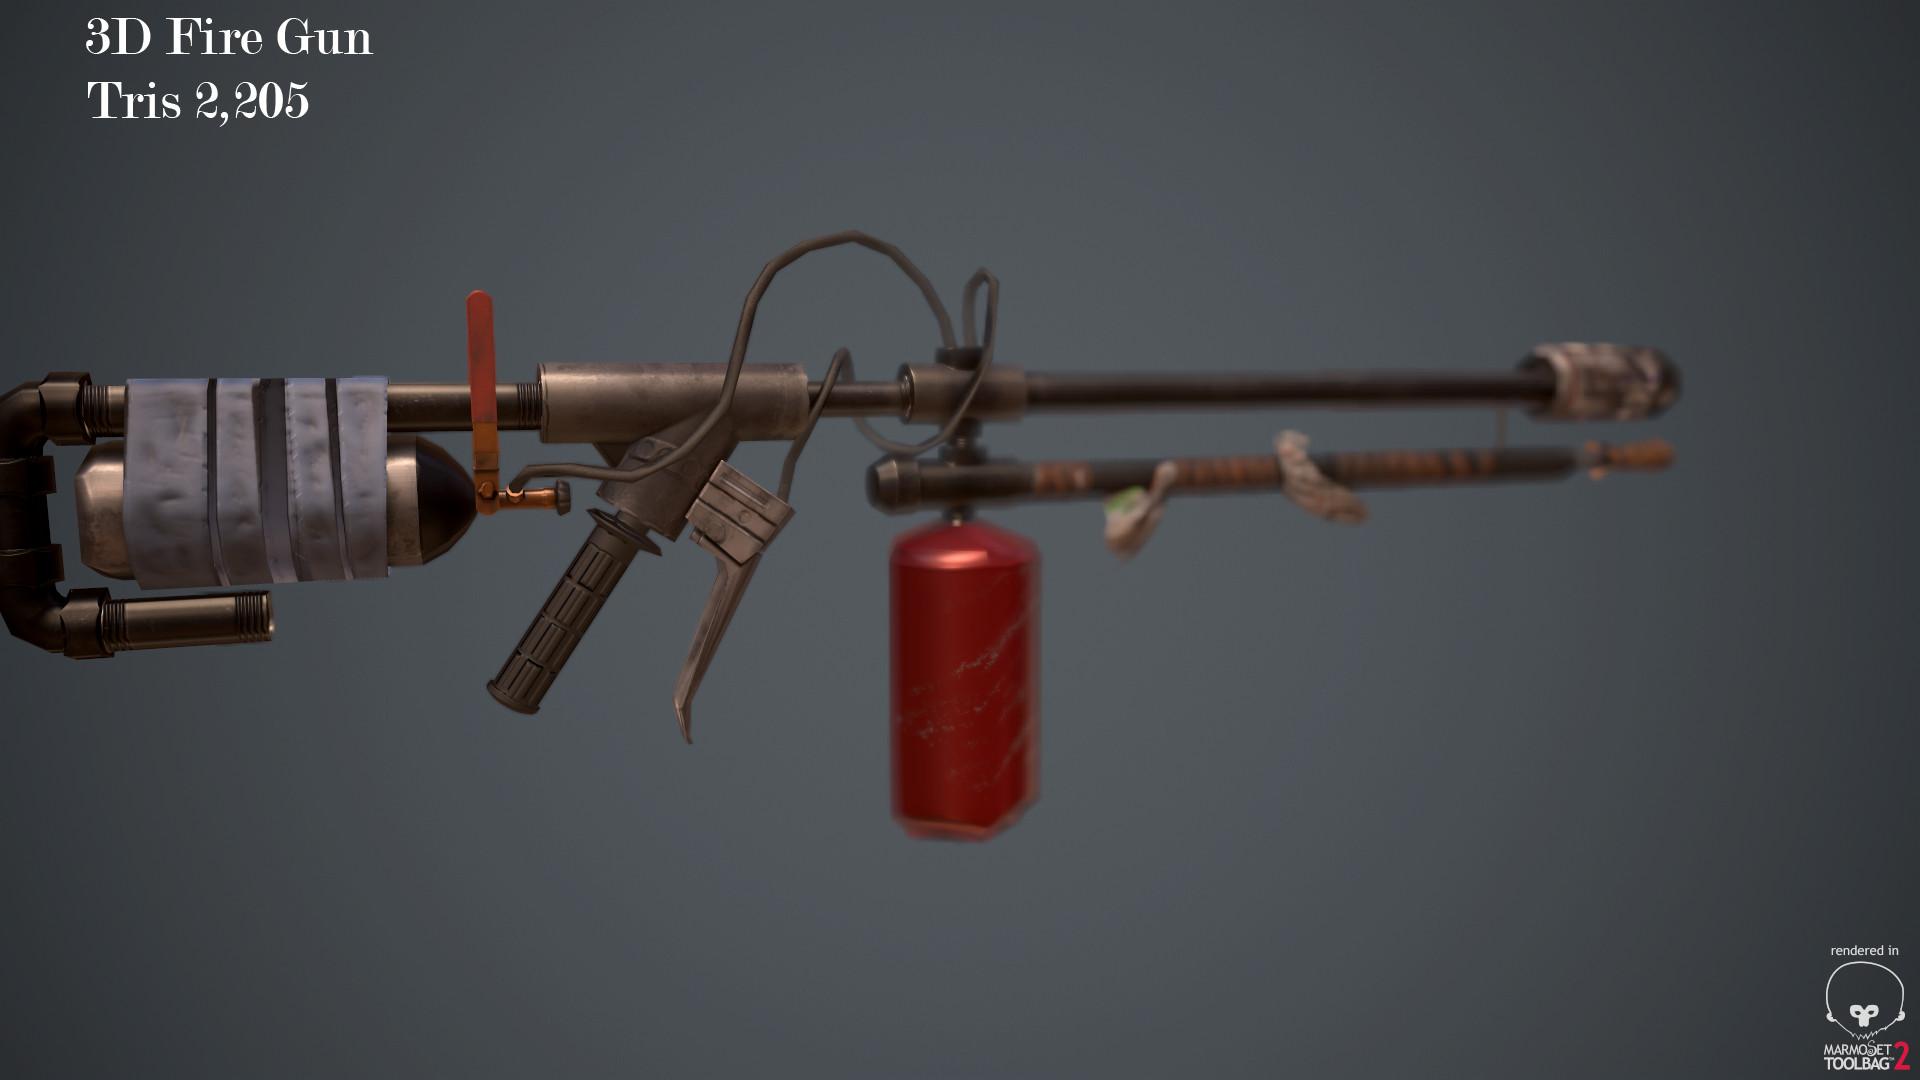 ArtStation - 3D Fire_Gun , Keshri Nandan Sharma